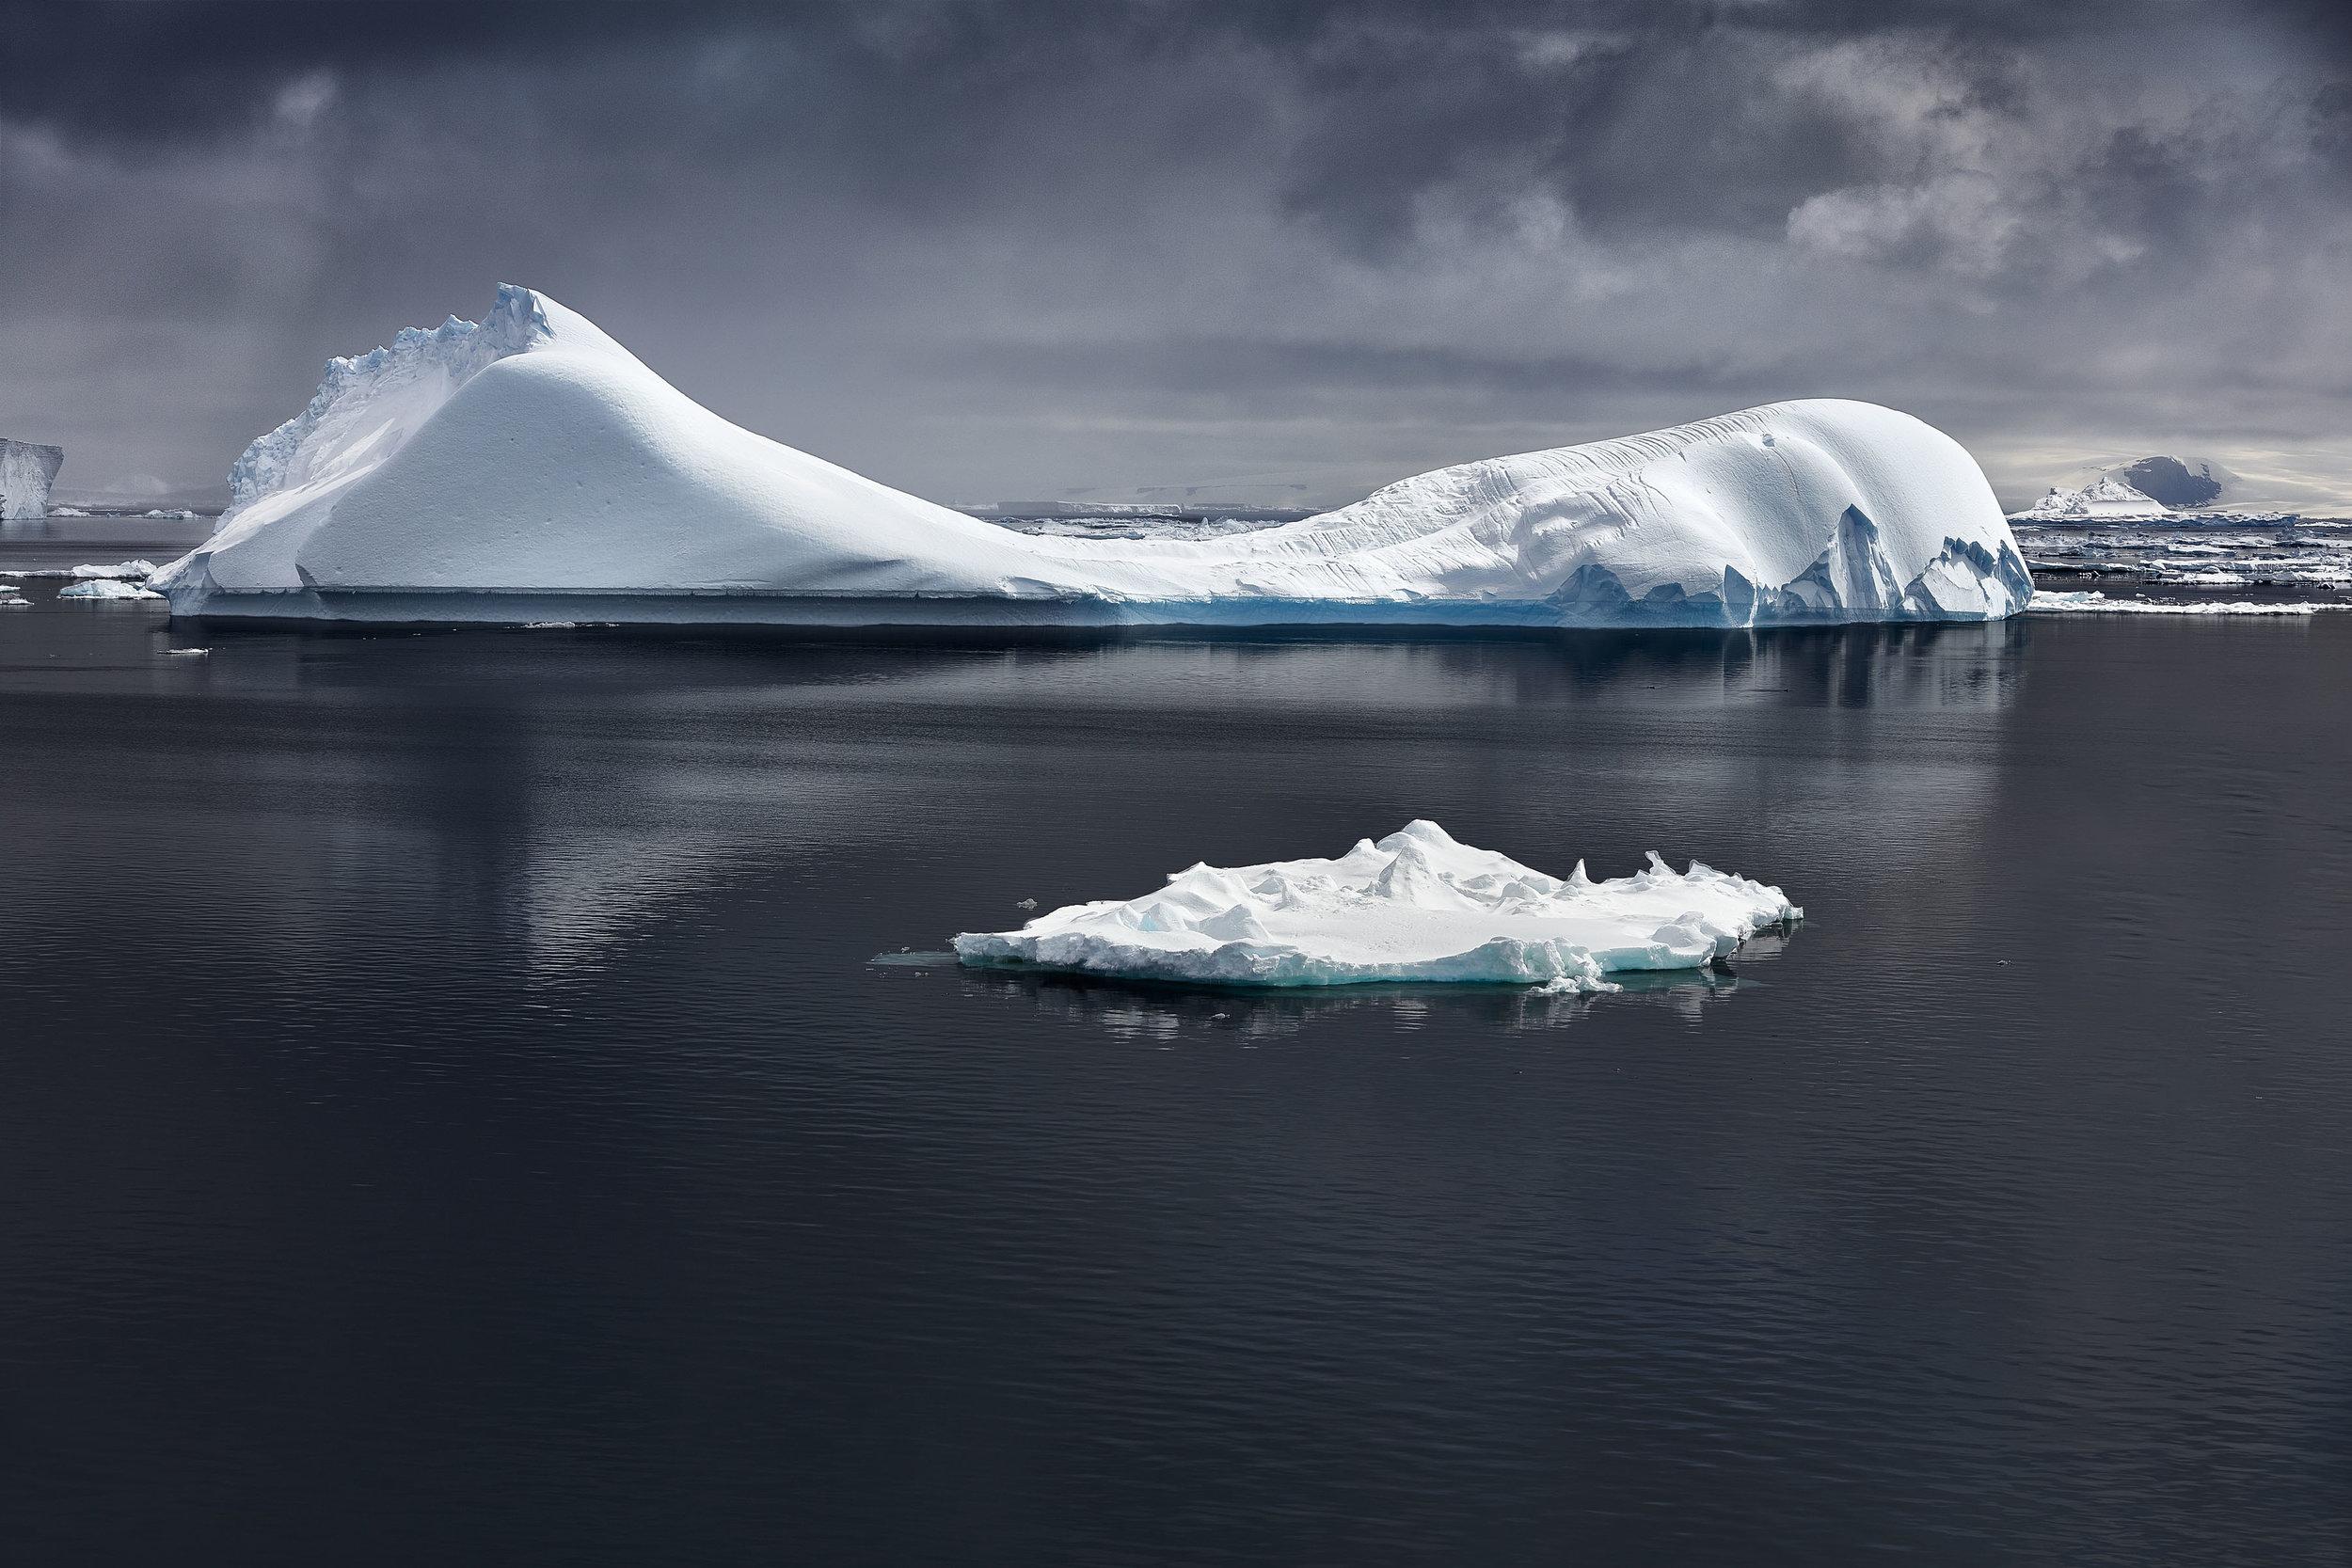 Iceberg_SquareSpace.jpg